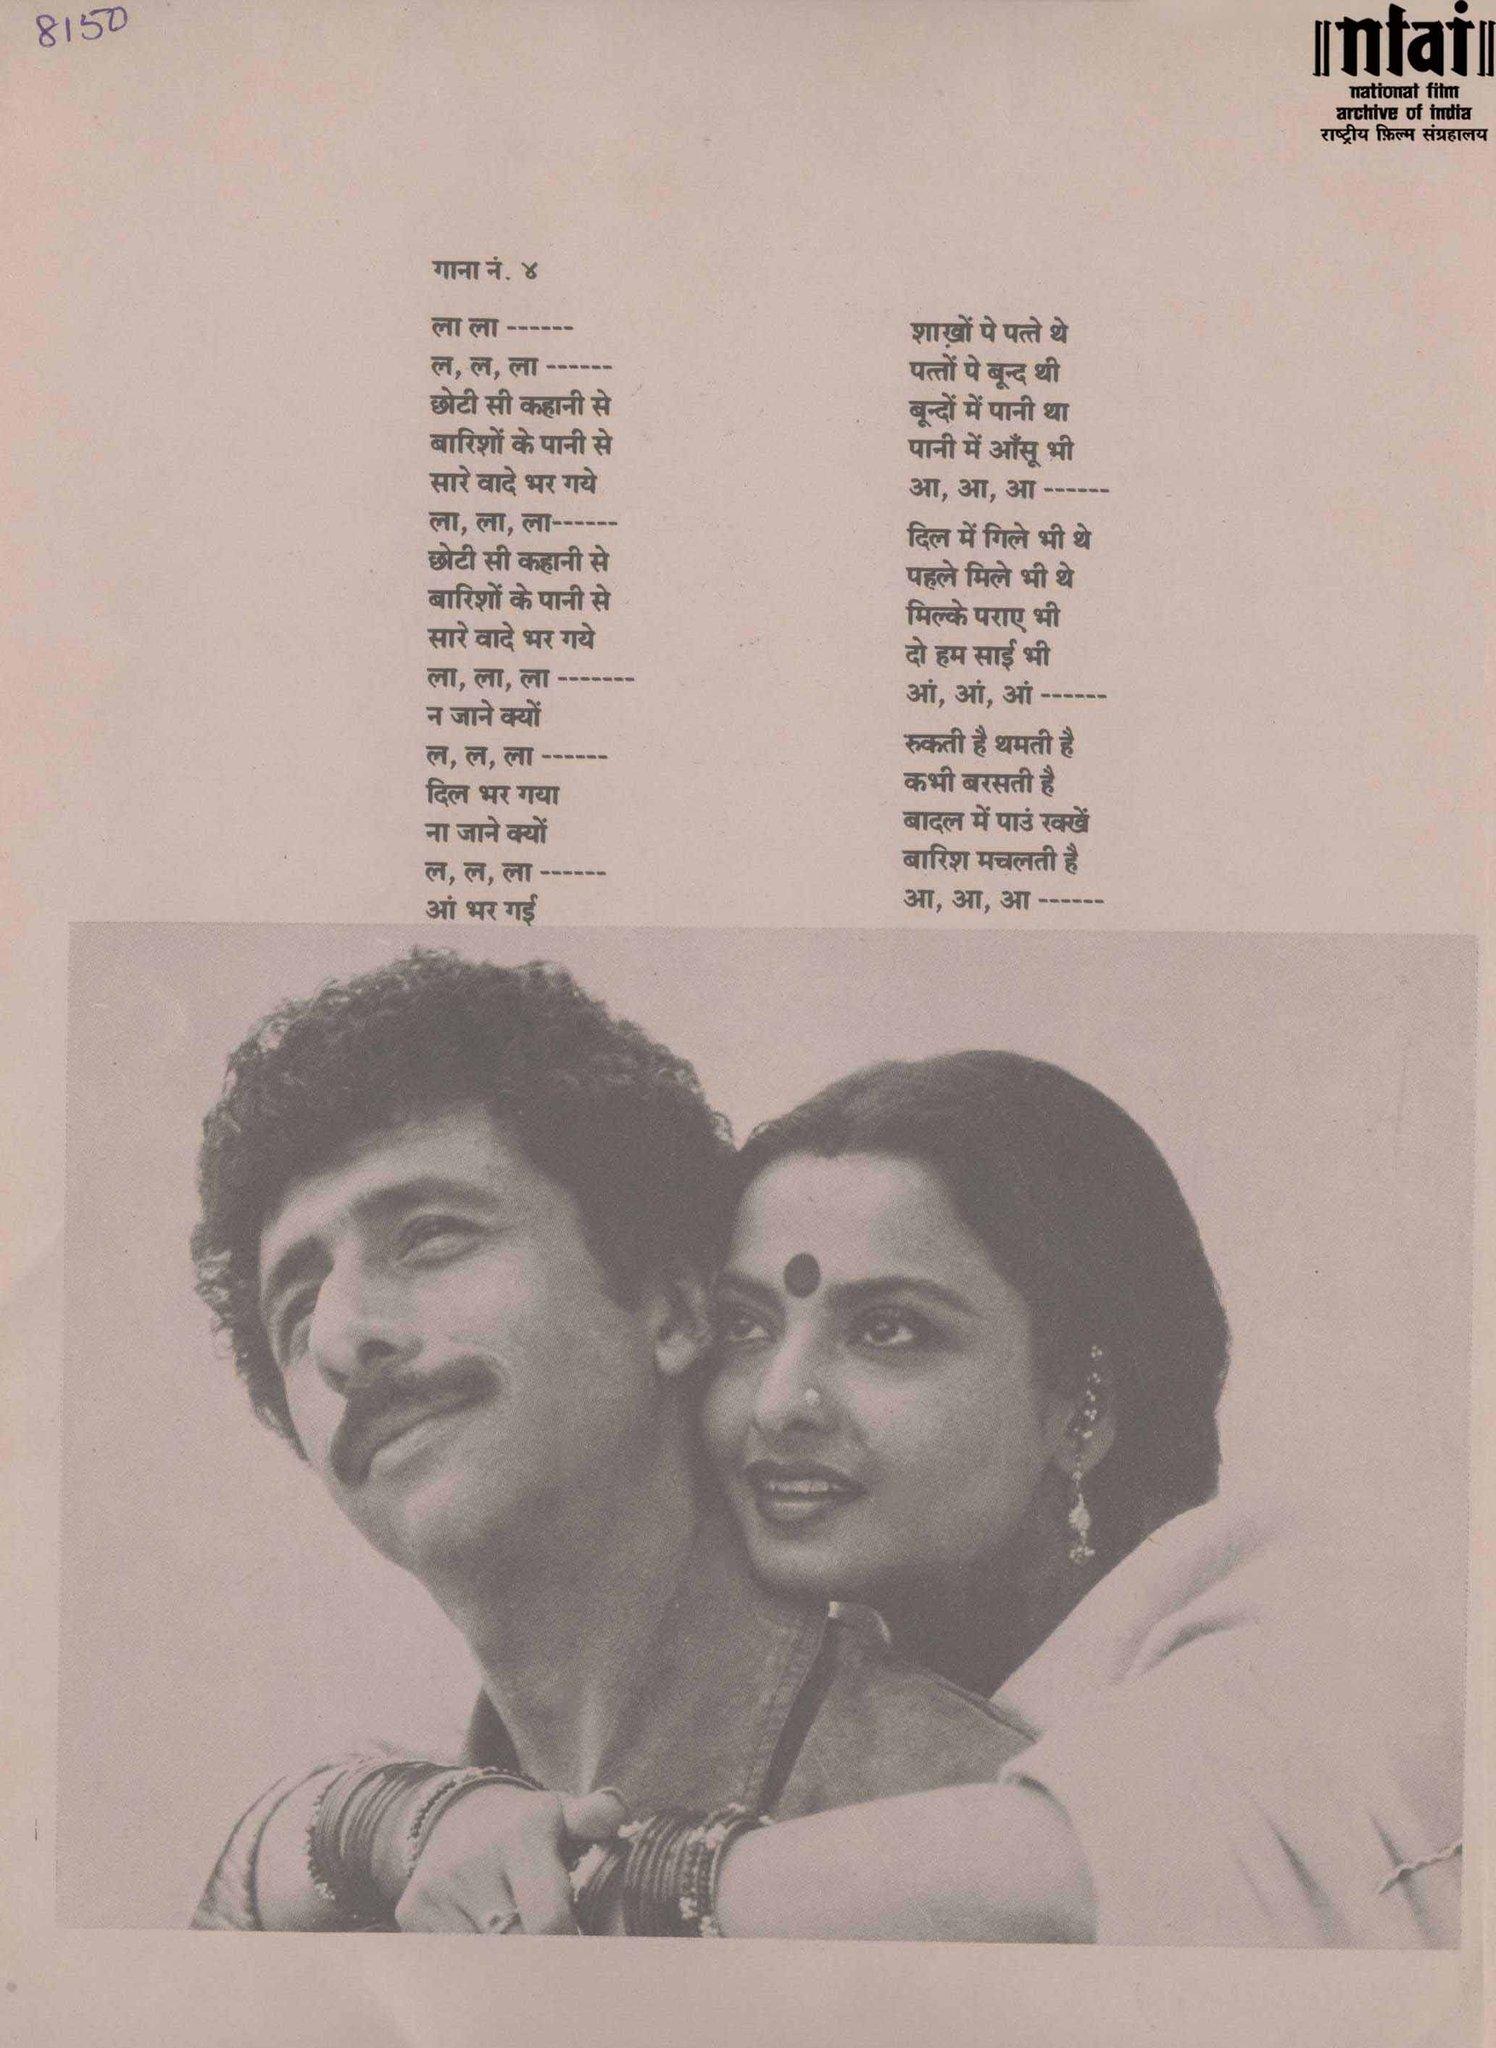 """Chhoti Si Kahaani Se"" From the #SongBooklet of #Gulzar's Ijaazat (1987) #SaturdayVibes #SaturdayThoughts #SaturdayMotivation #SaturdayMorning https://t.co/c5ngbsPo5r"